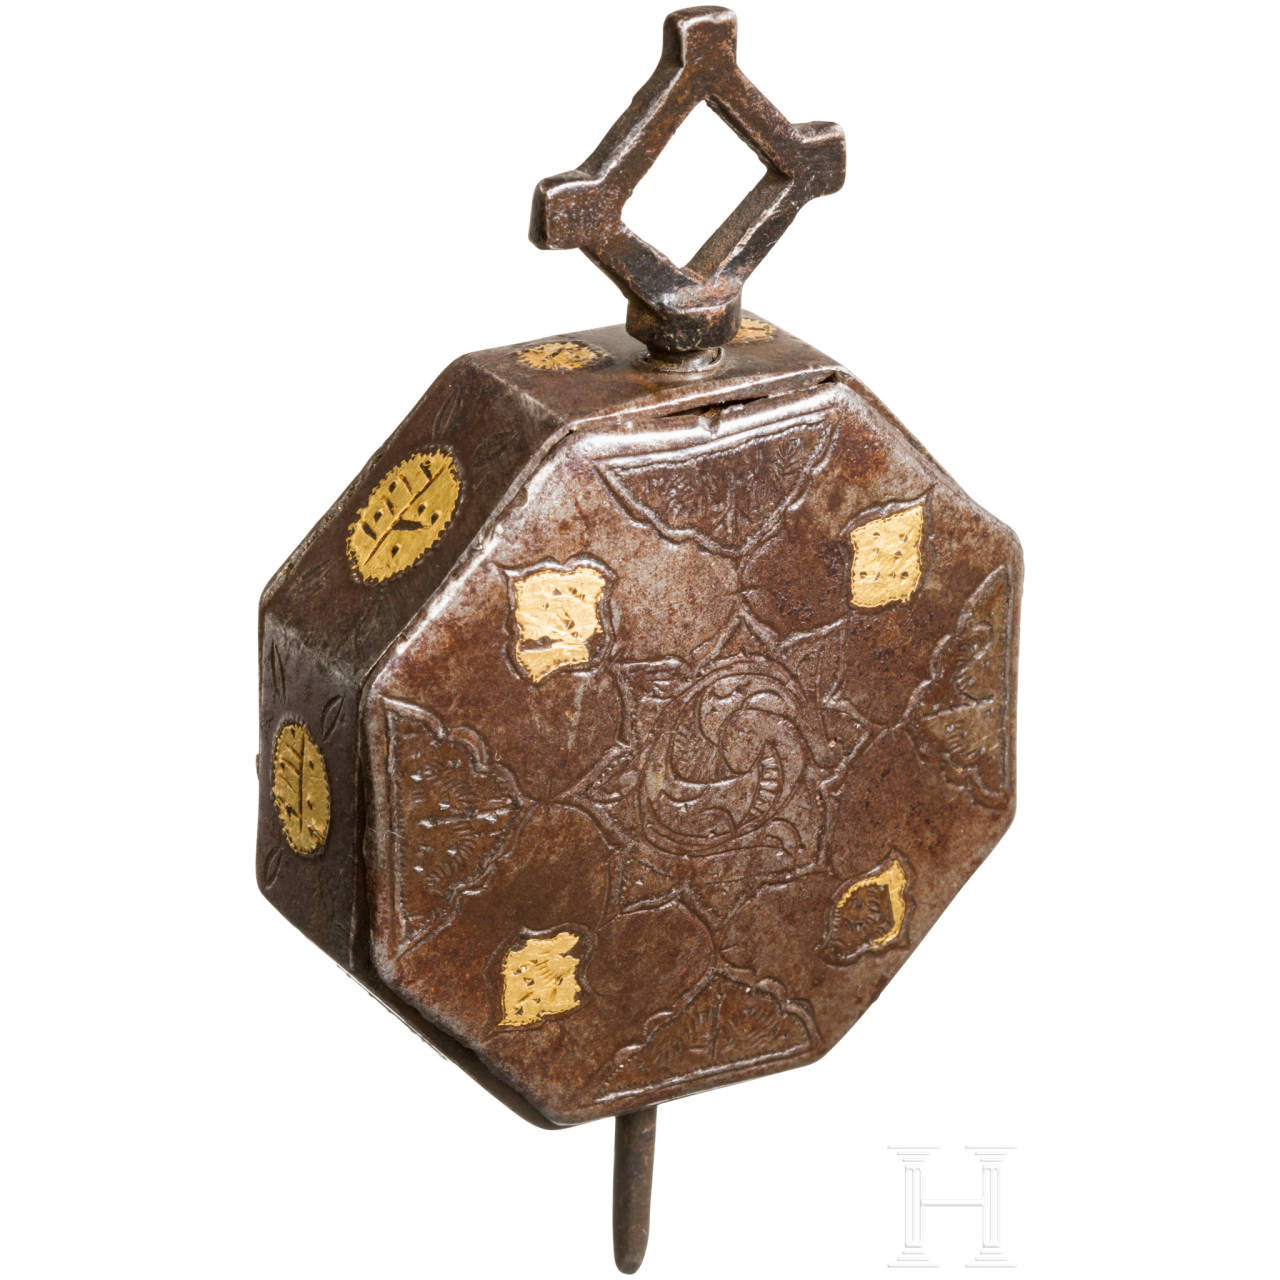 An Ottoman amulet case, 19th century